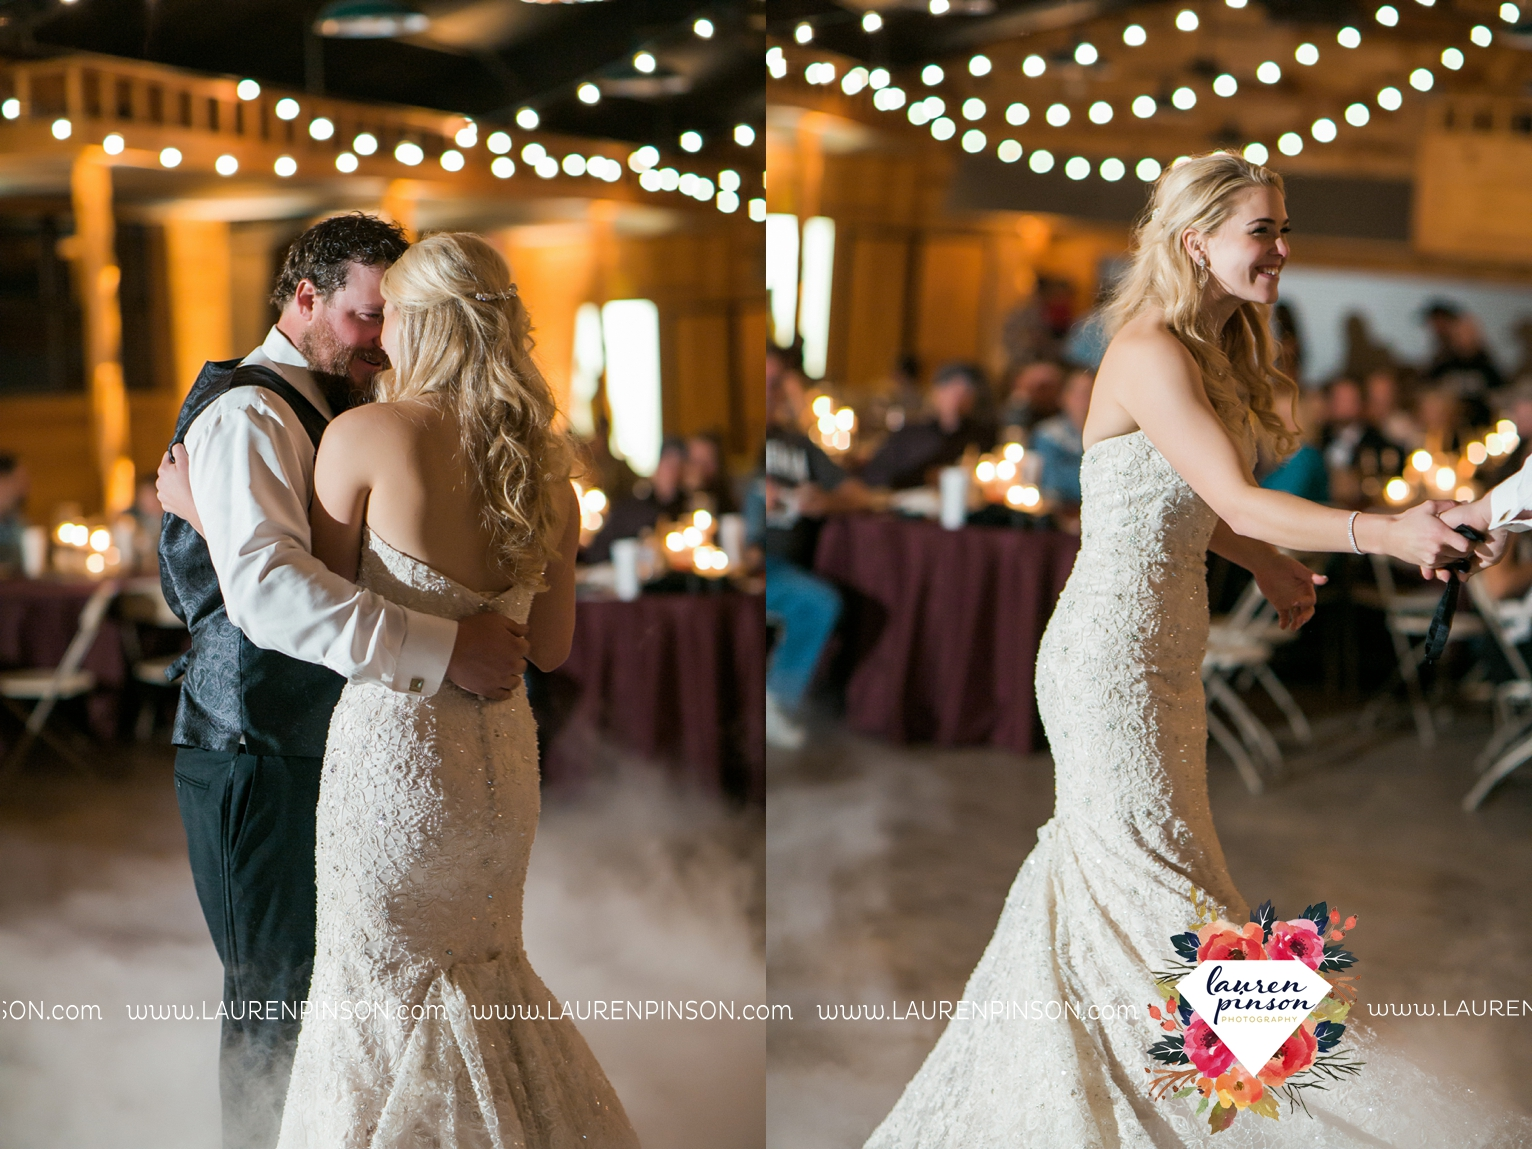 rustic-wichita-falls-texas-wedding-photographer-gold-glam-mayfield-events-market-street-united-allue-bridals-fall_1785.jpg